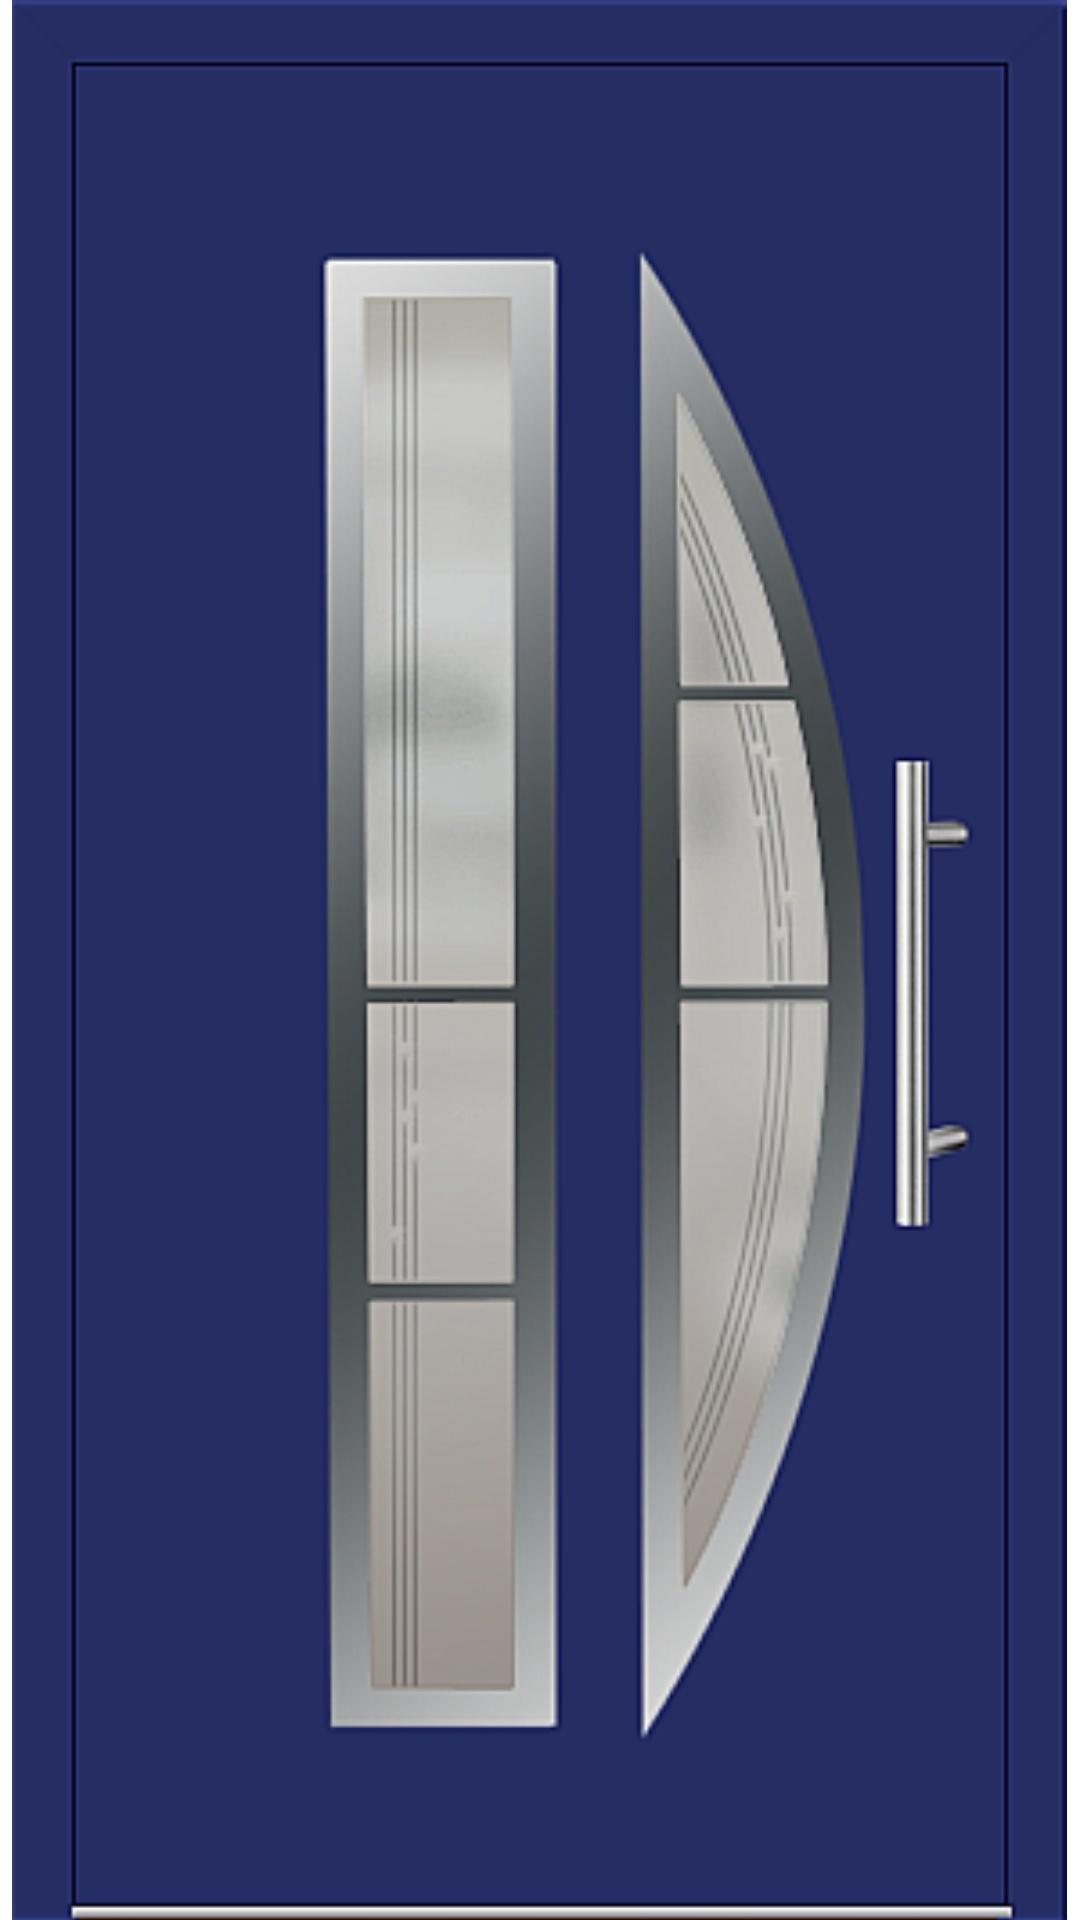 Aluminium Haustür Modell 6525-75 ultramarinblau